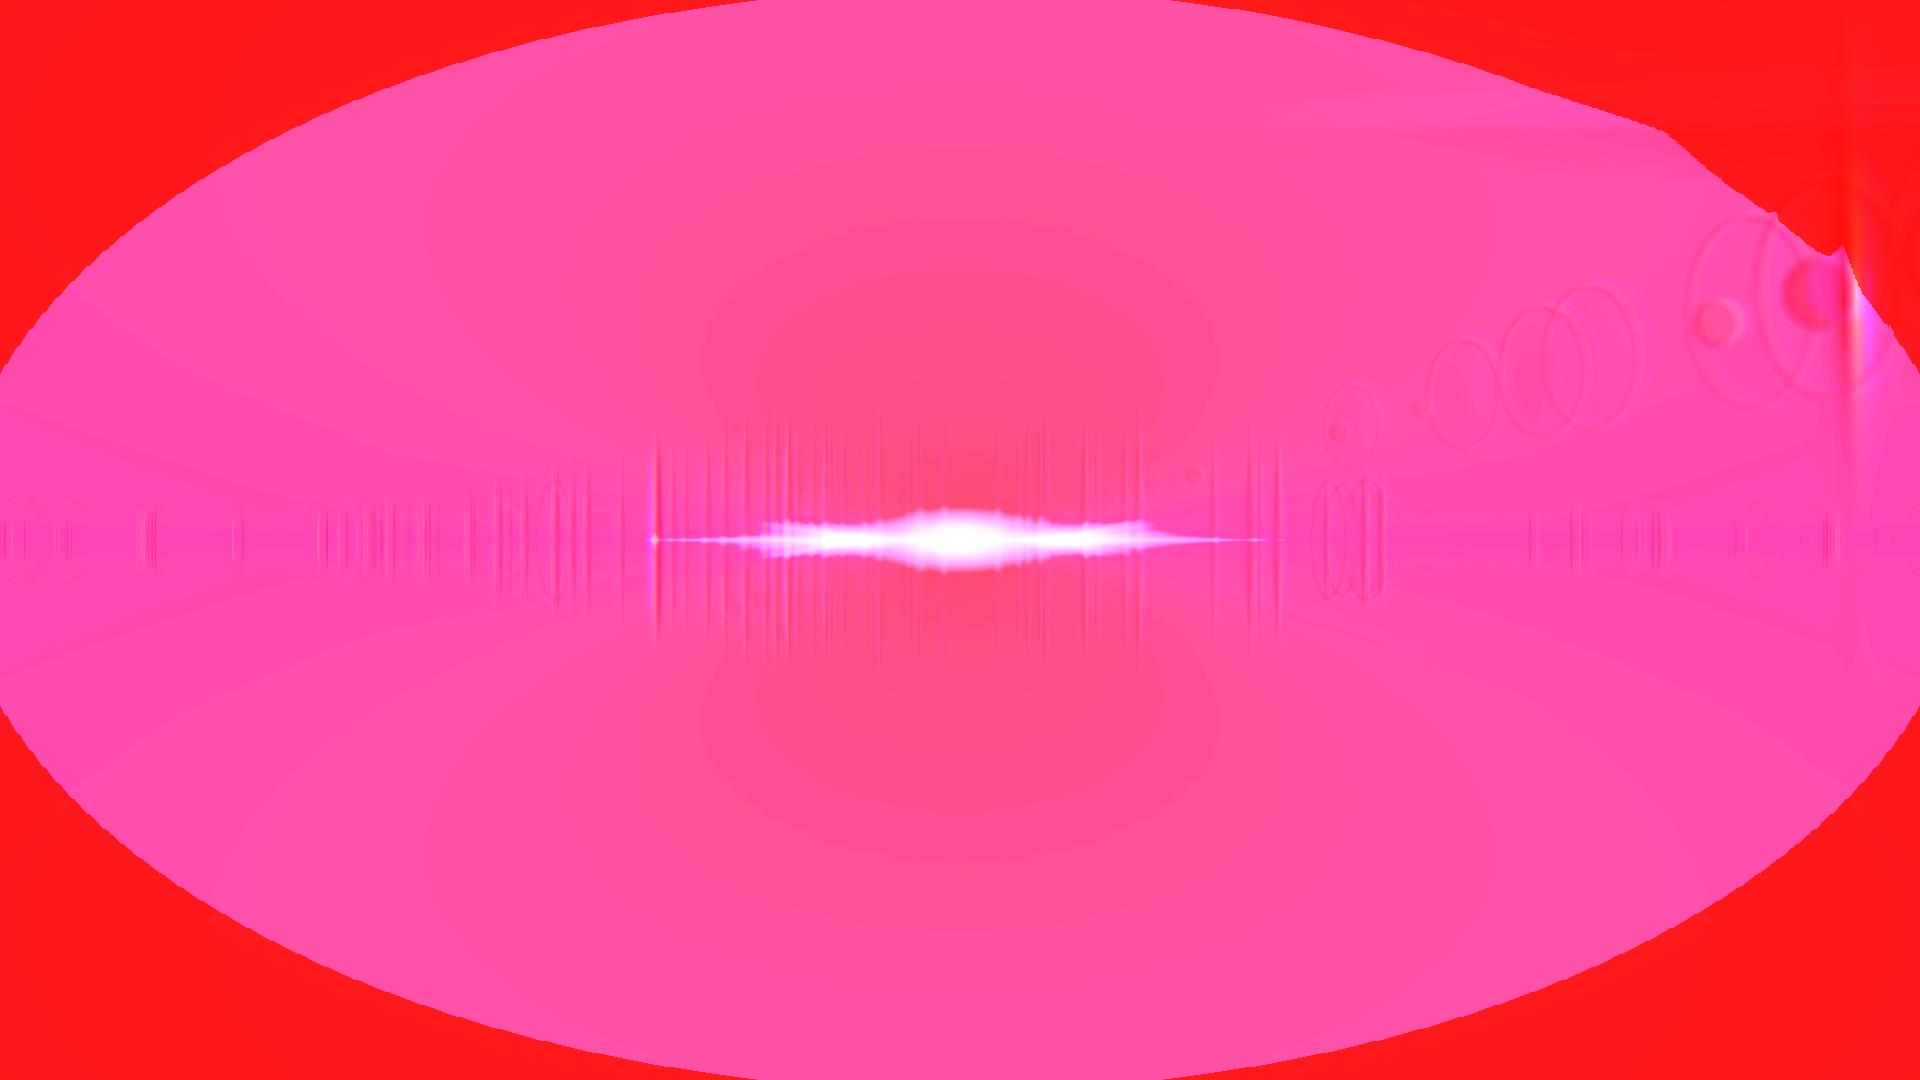 laser eyes meme png 10 free Cliparts | Download images on ...